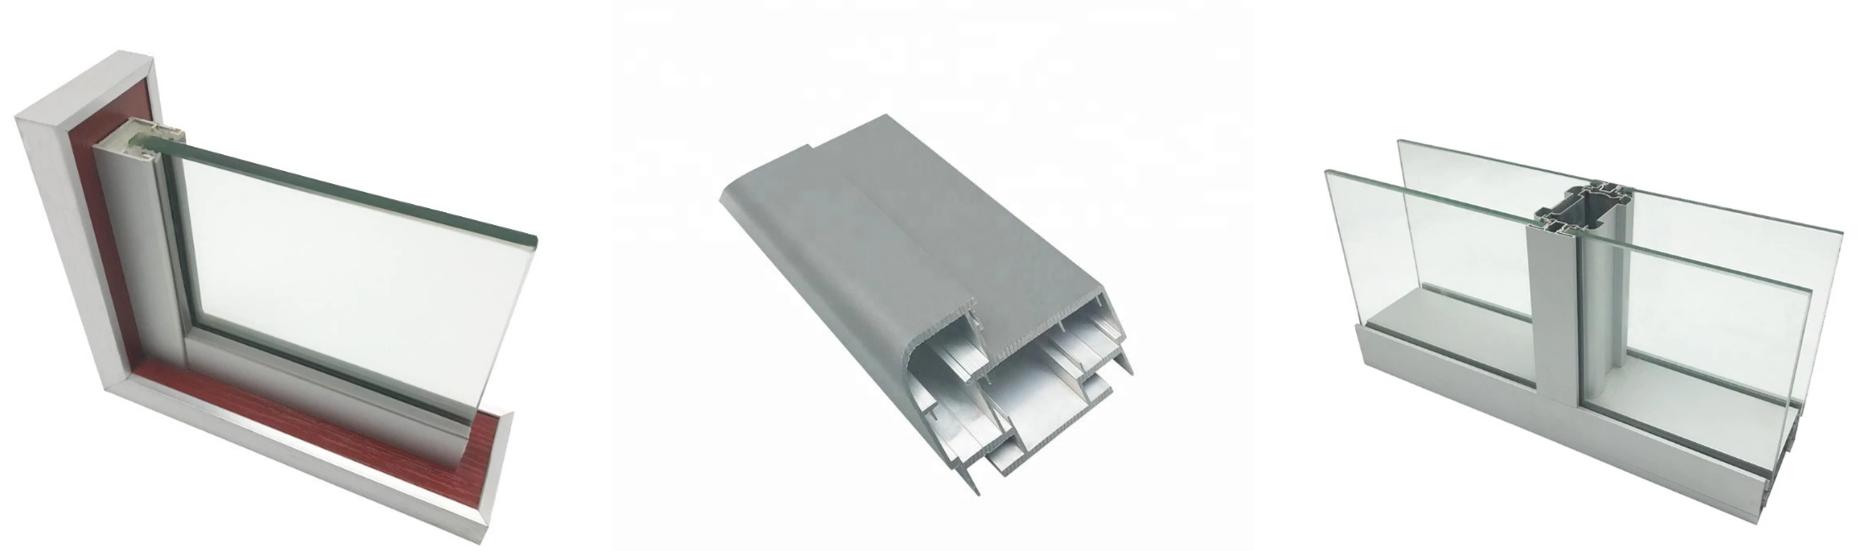 Bunge-Professional Glass Partition Glass Door Partition Supplier-1